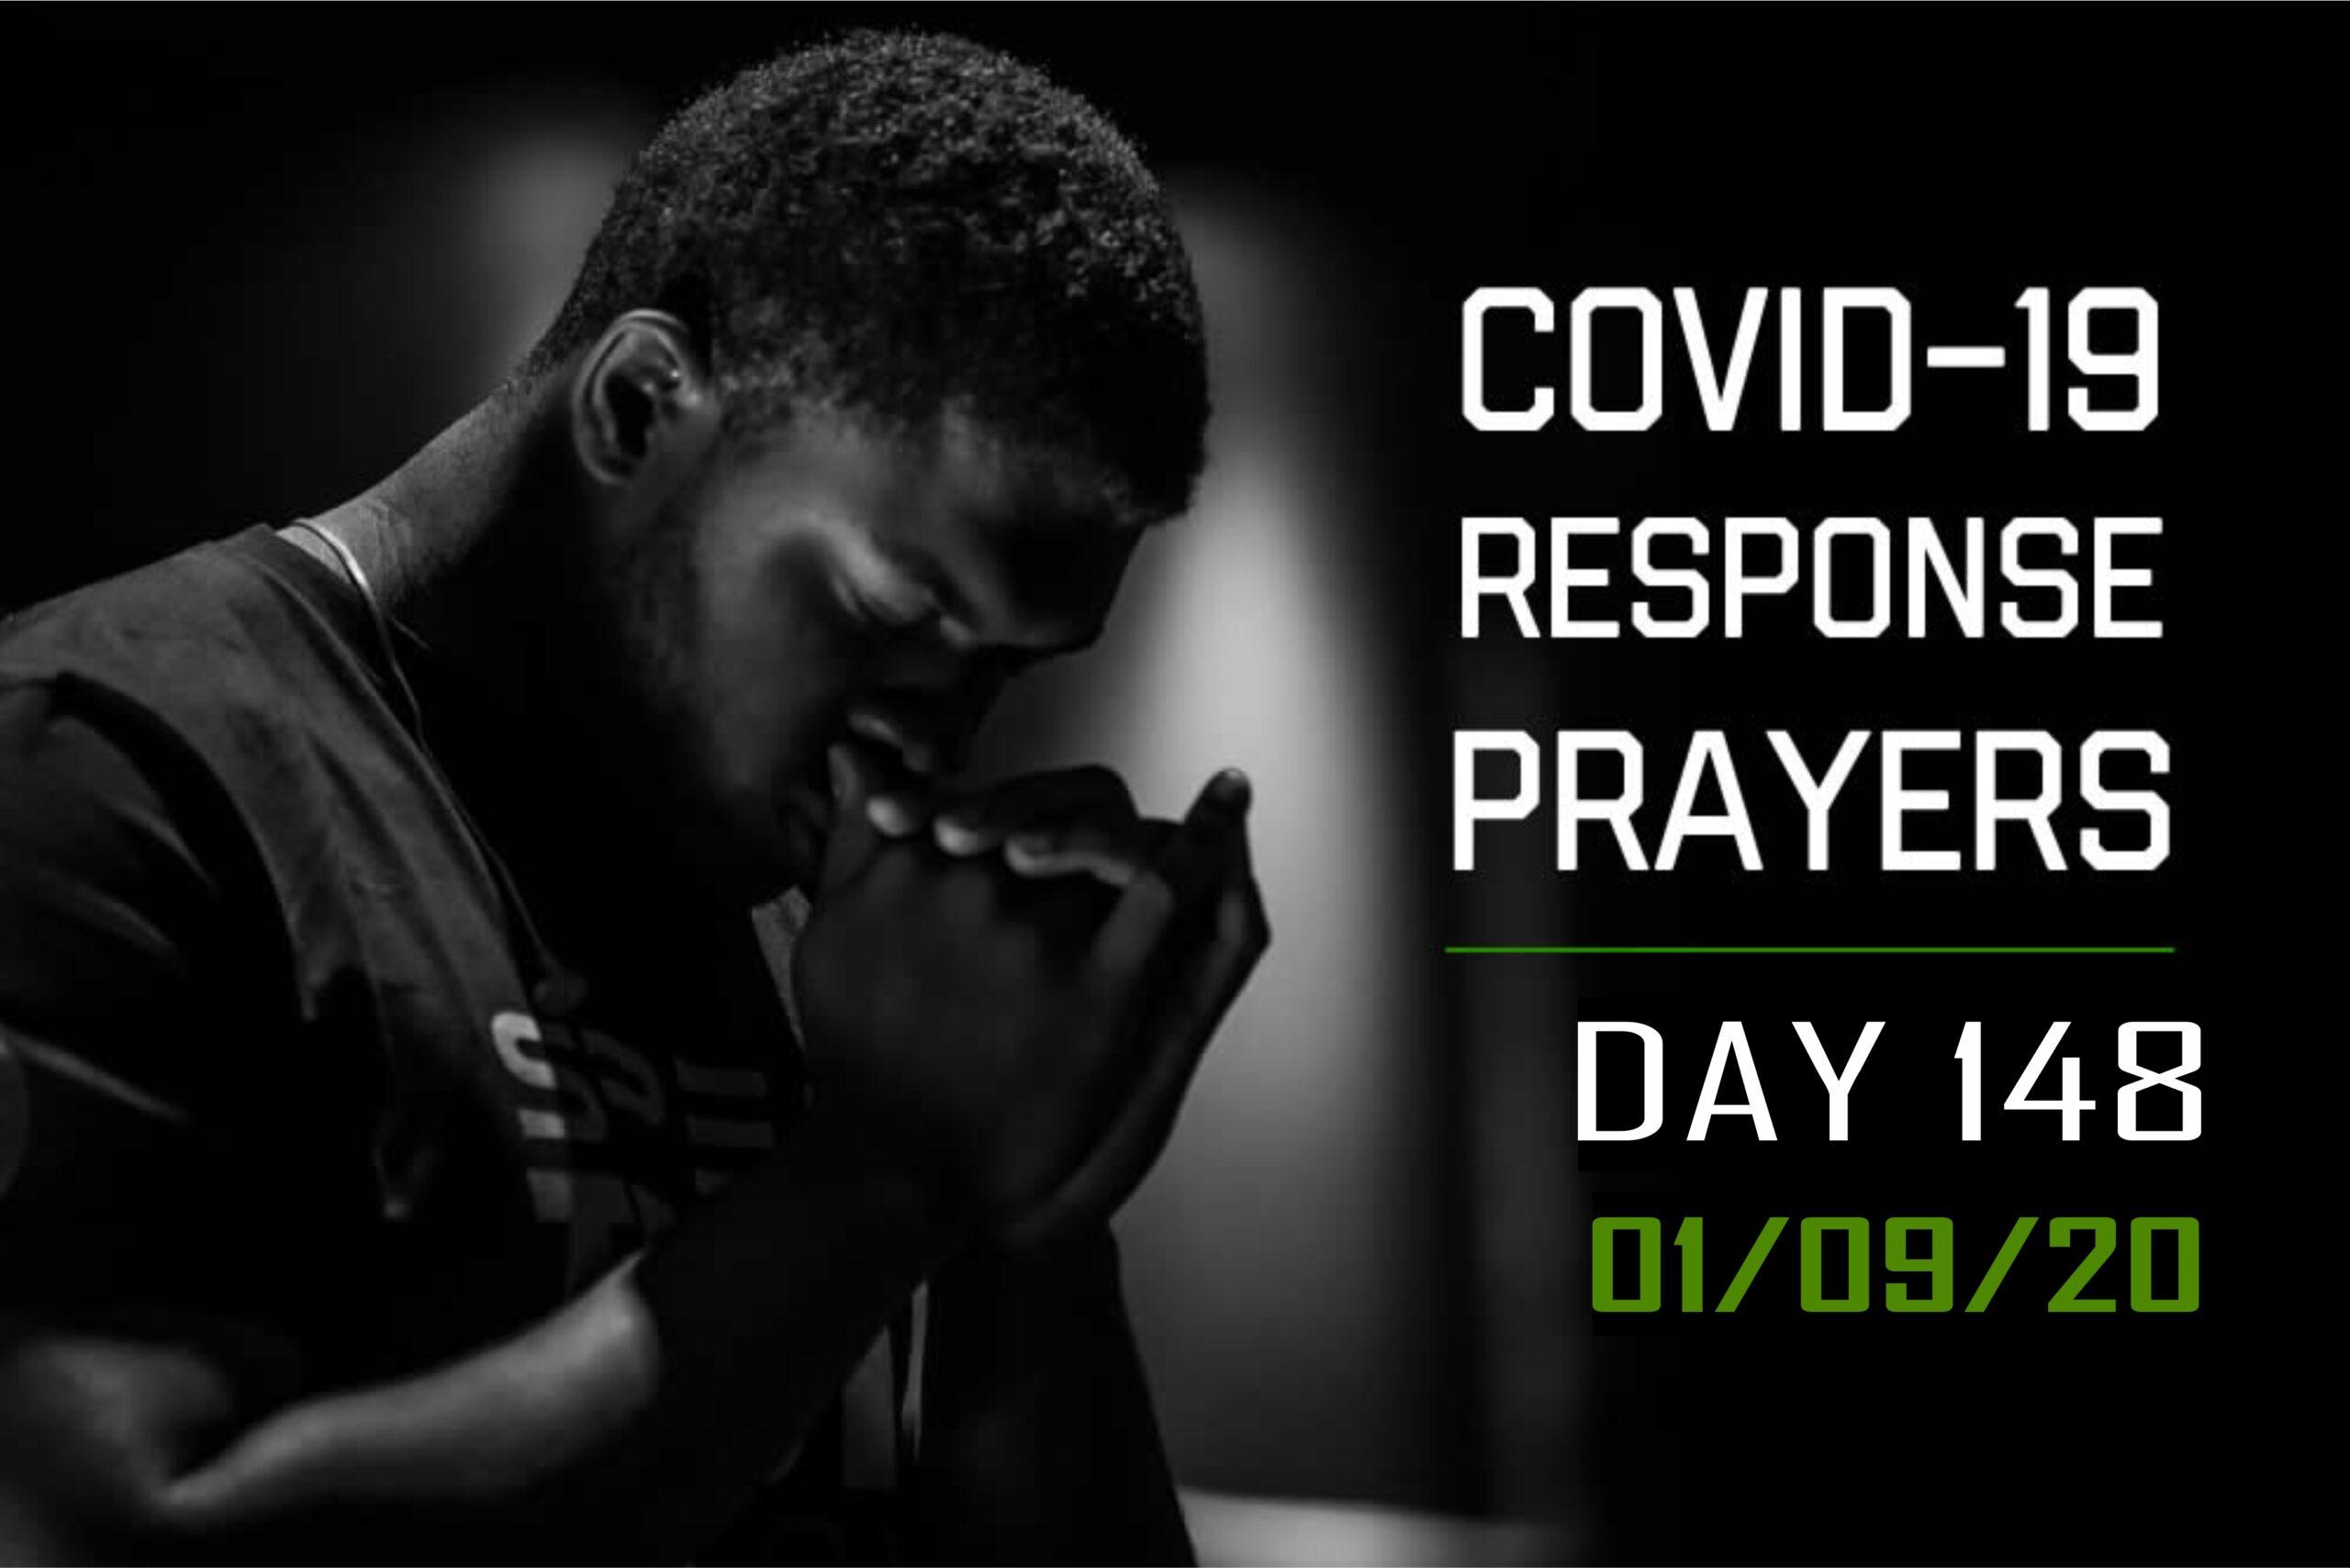 COVID-19 Response Prayers Day – 148